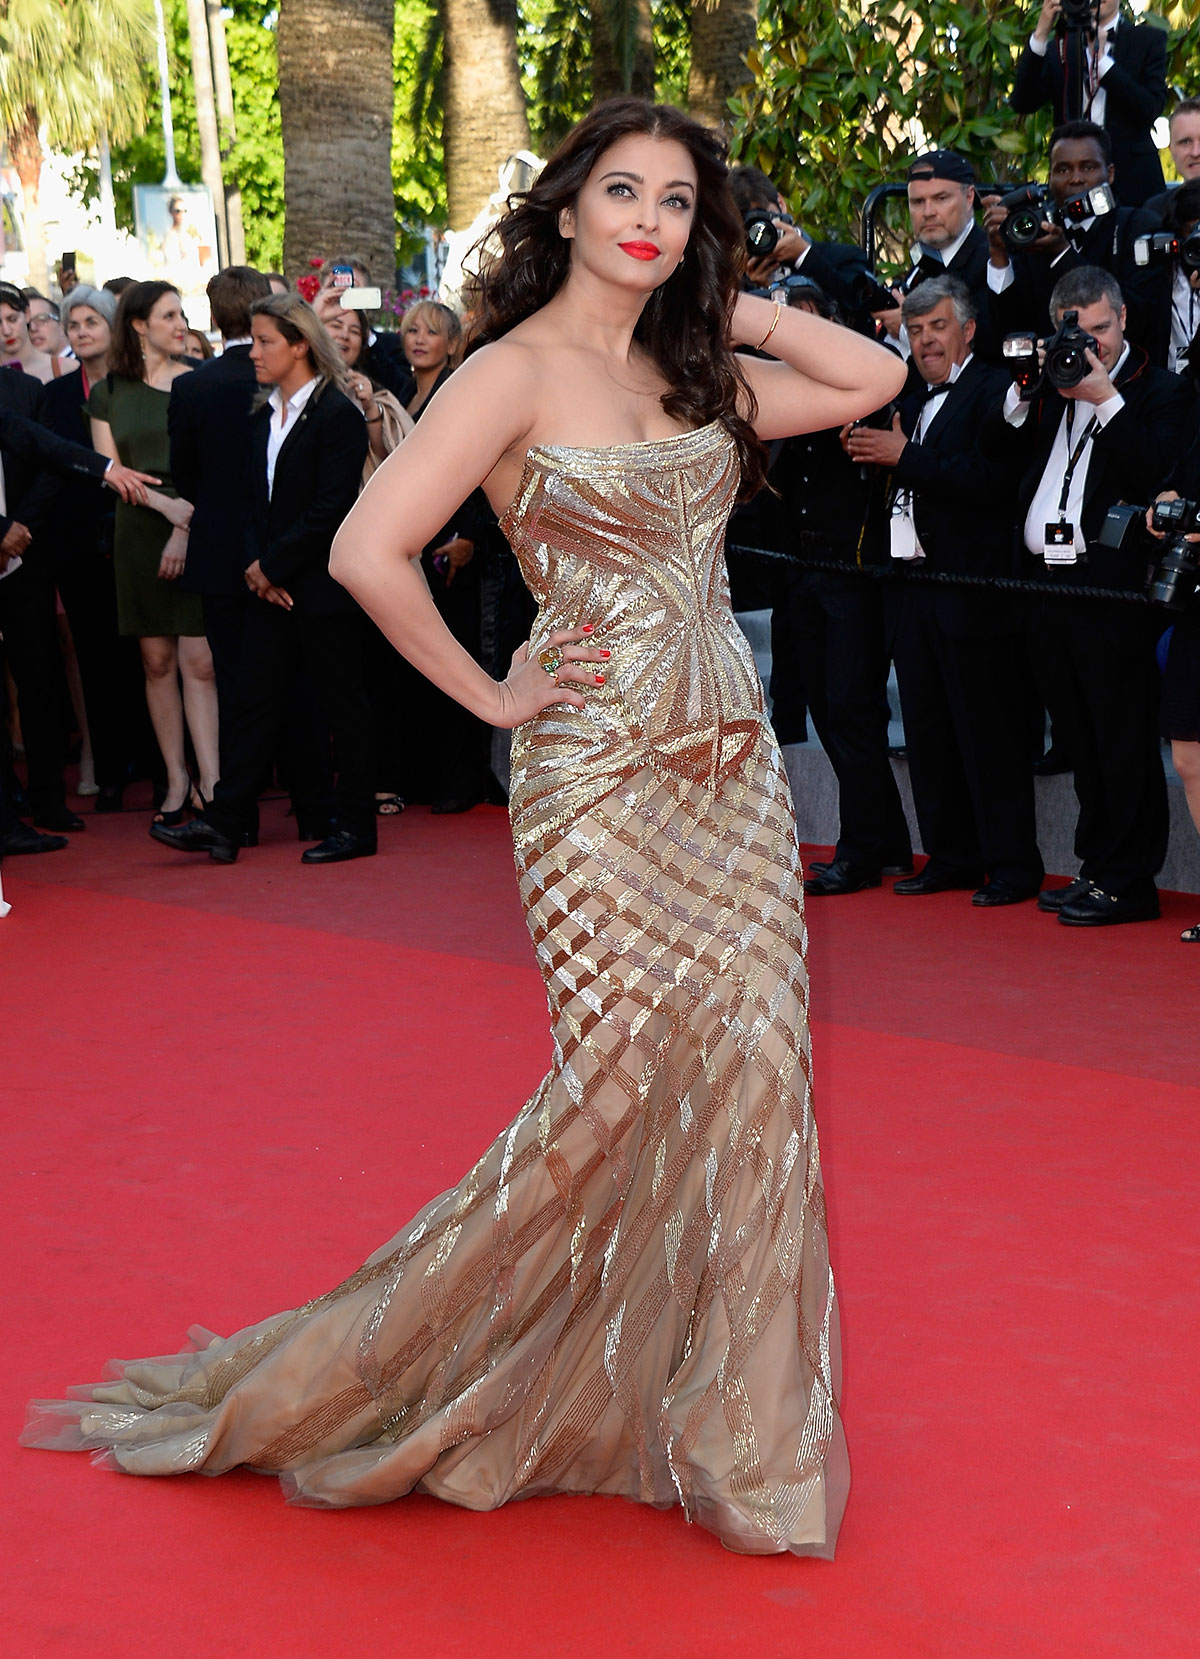 Aishwarya Rai Bachchan's Cannes Film Festival 2014 Looks ... |Aishwarya Rai 2014 March